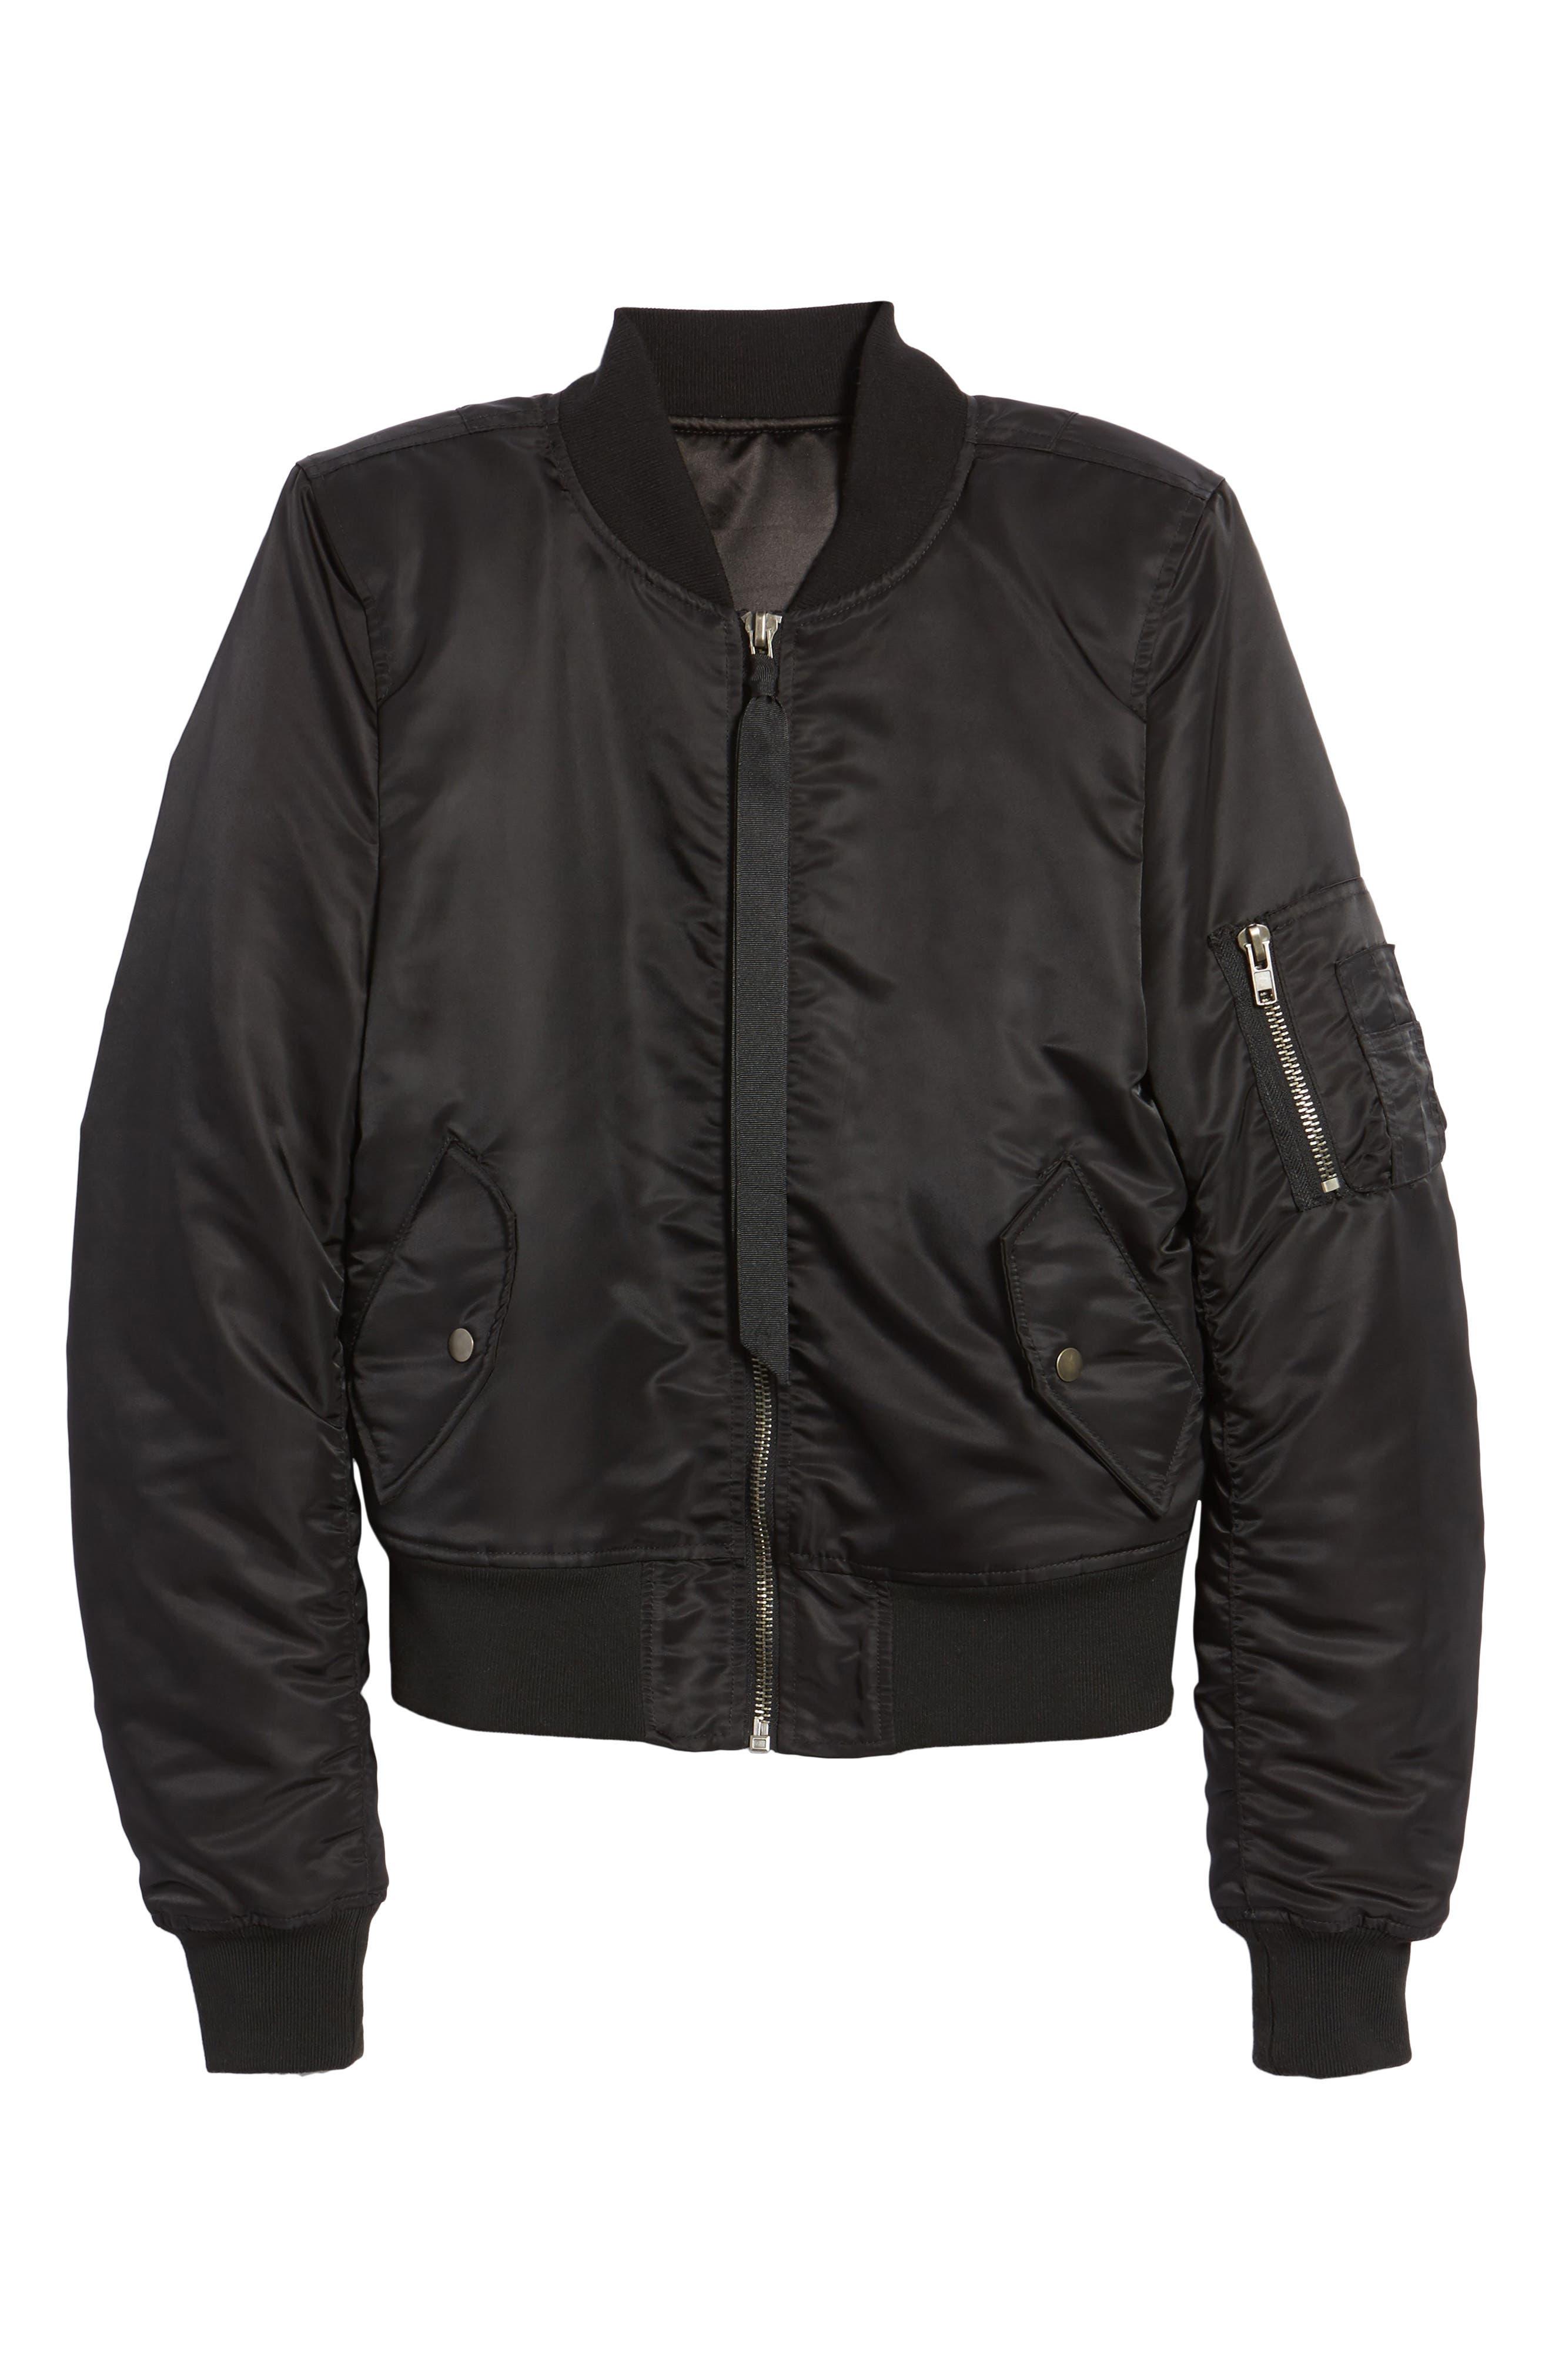 Bomber Jacket,                             Alternate thumbnail 5, color,                             001